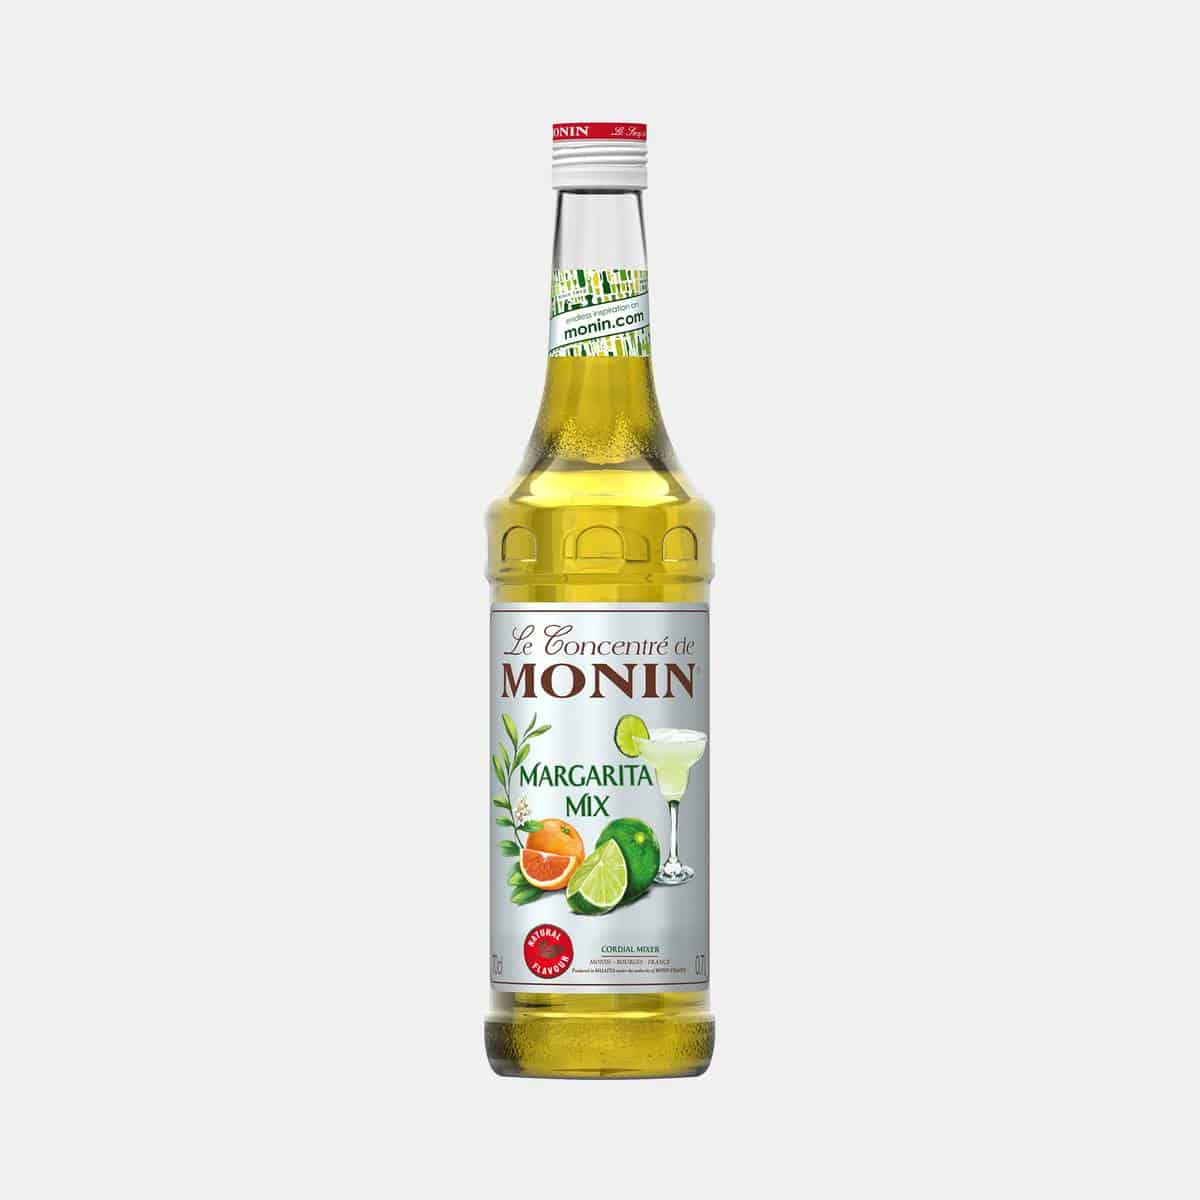 Monin Margarita Mix Concentrate 700ml Glass Bottle